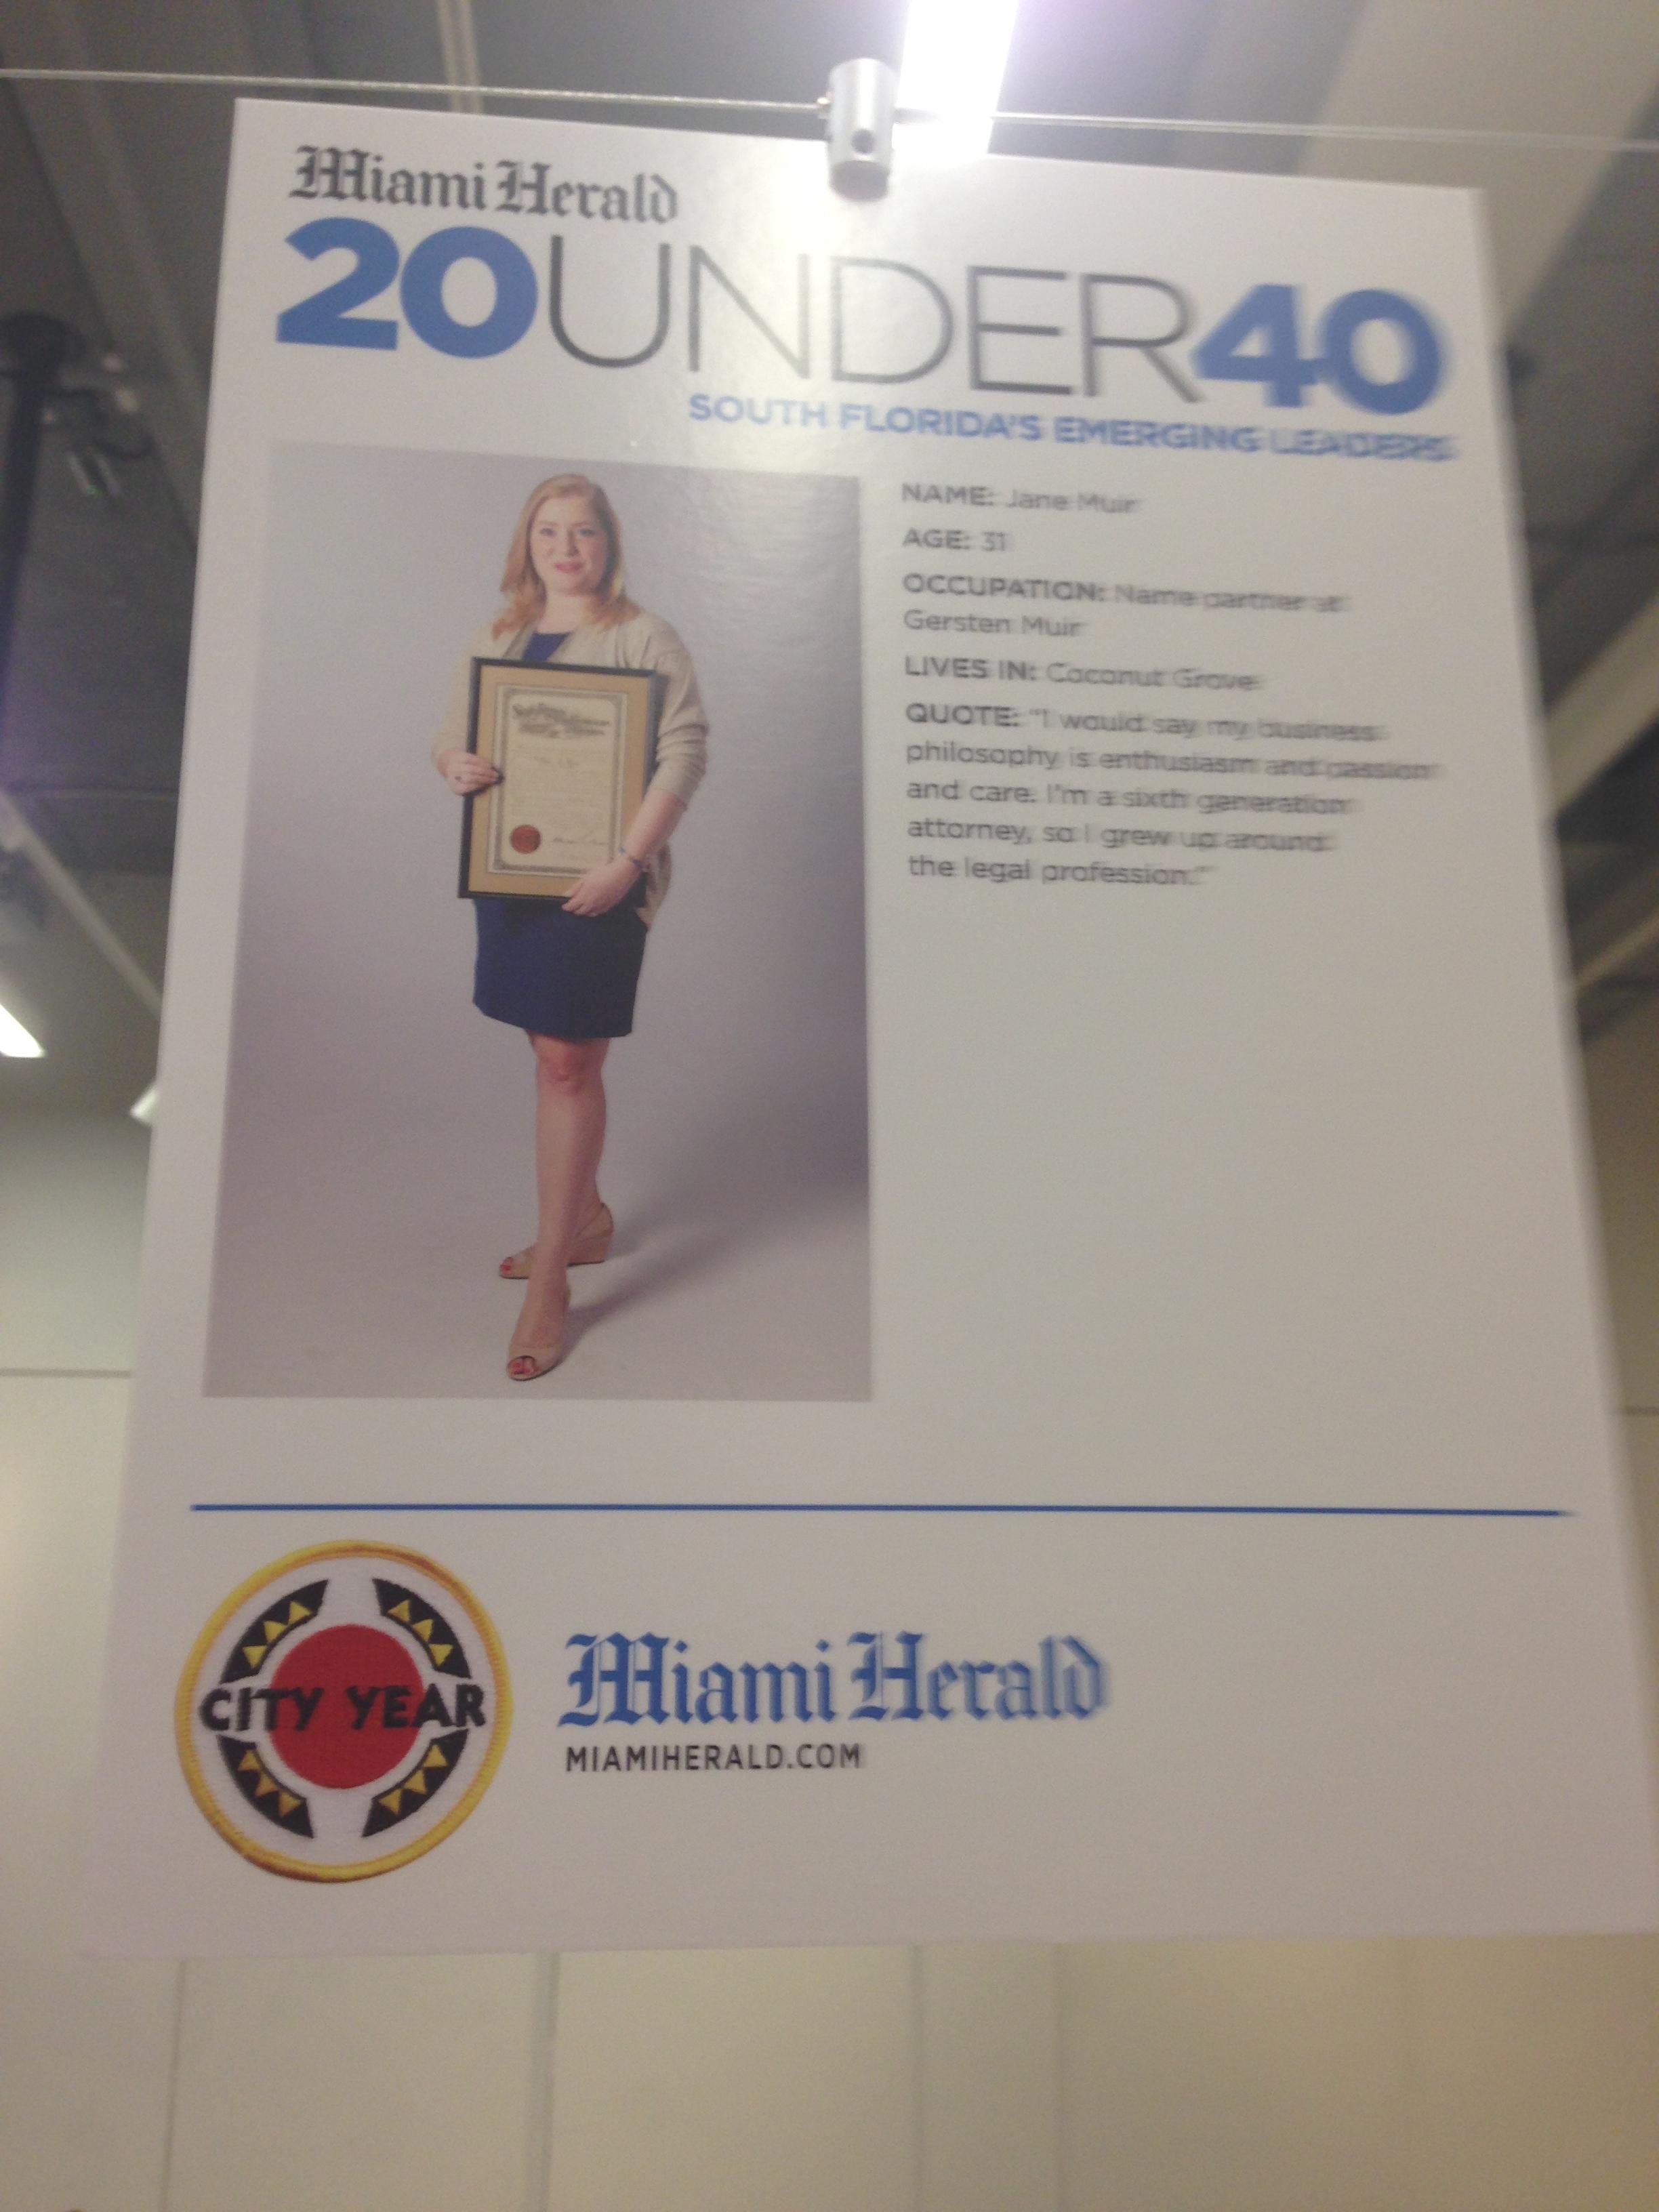 Miami Herald 20 under 40 Awards Ceremony